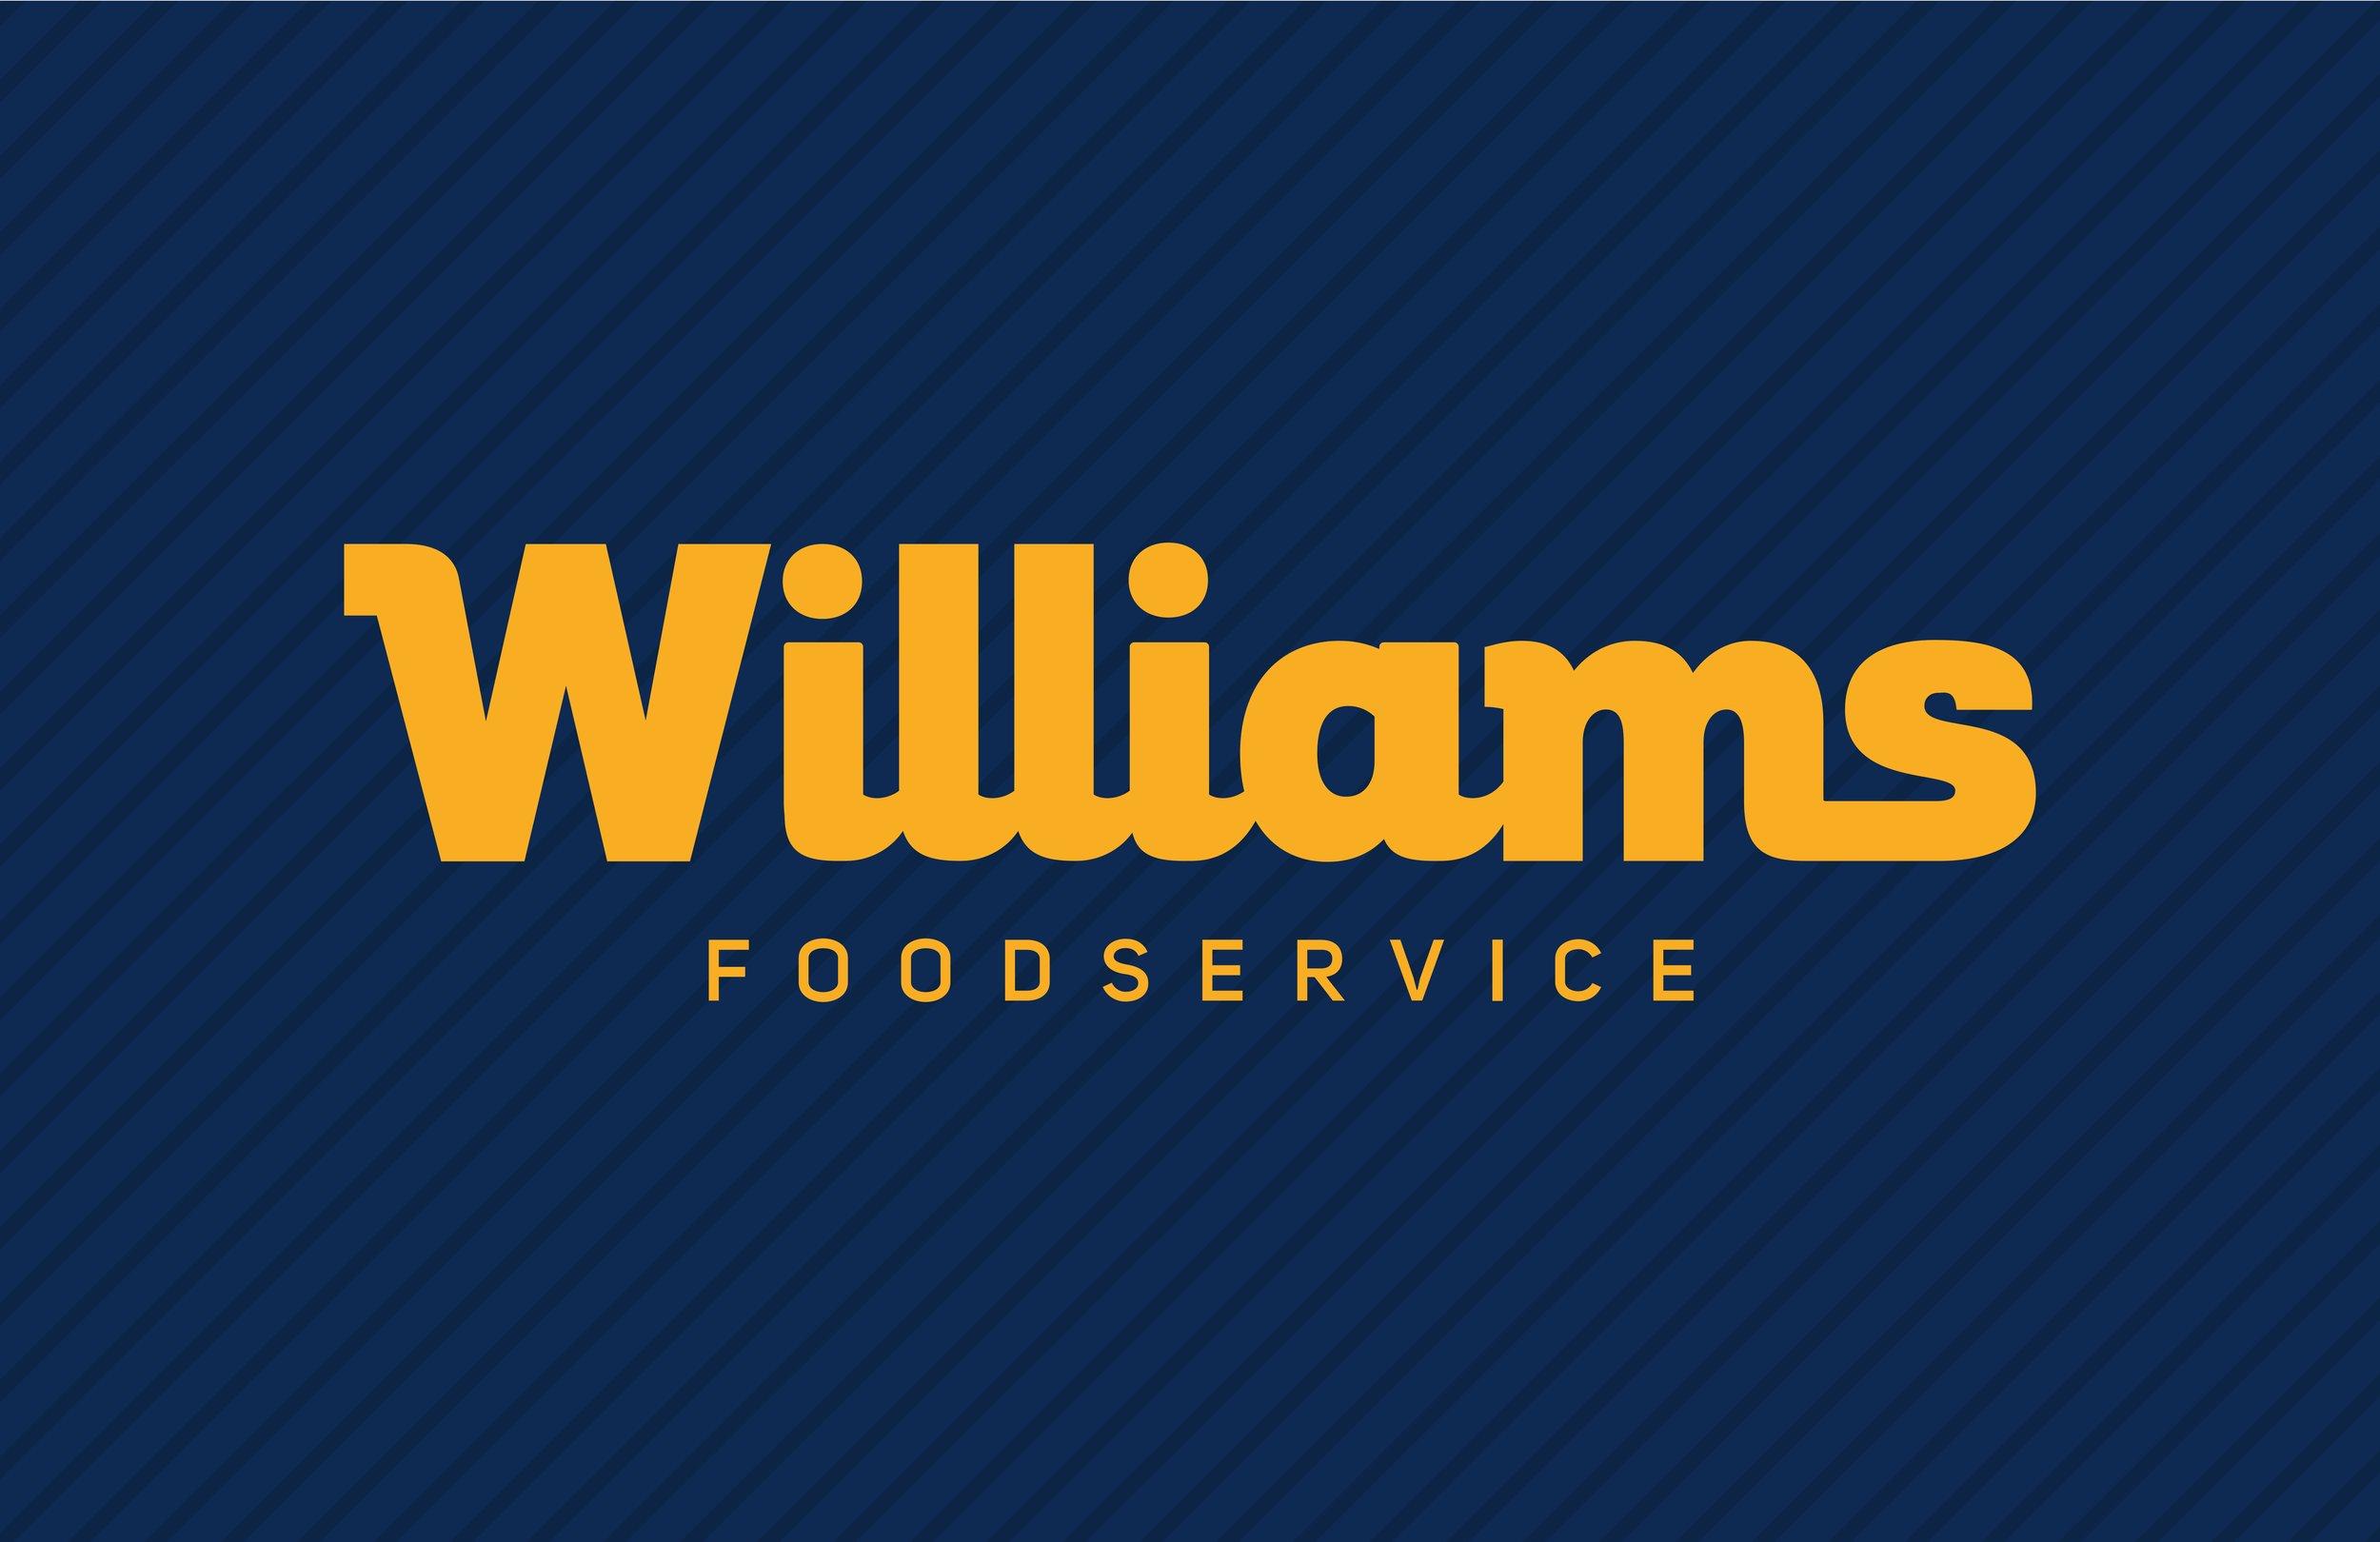 Williams Logo1_001.jpg